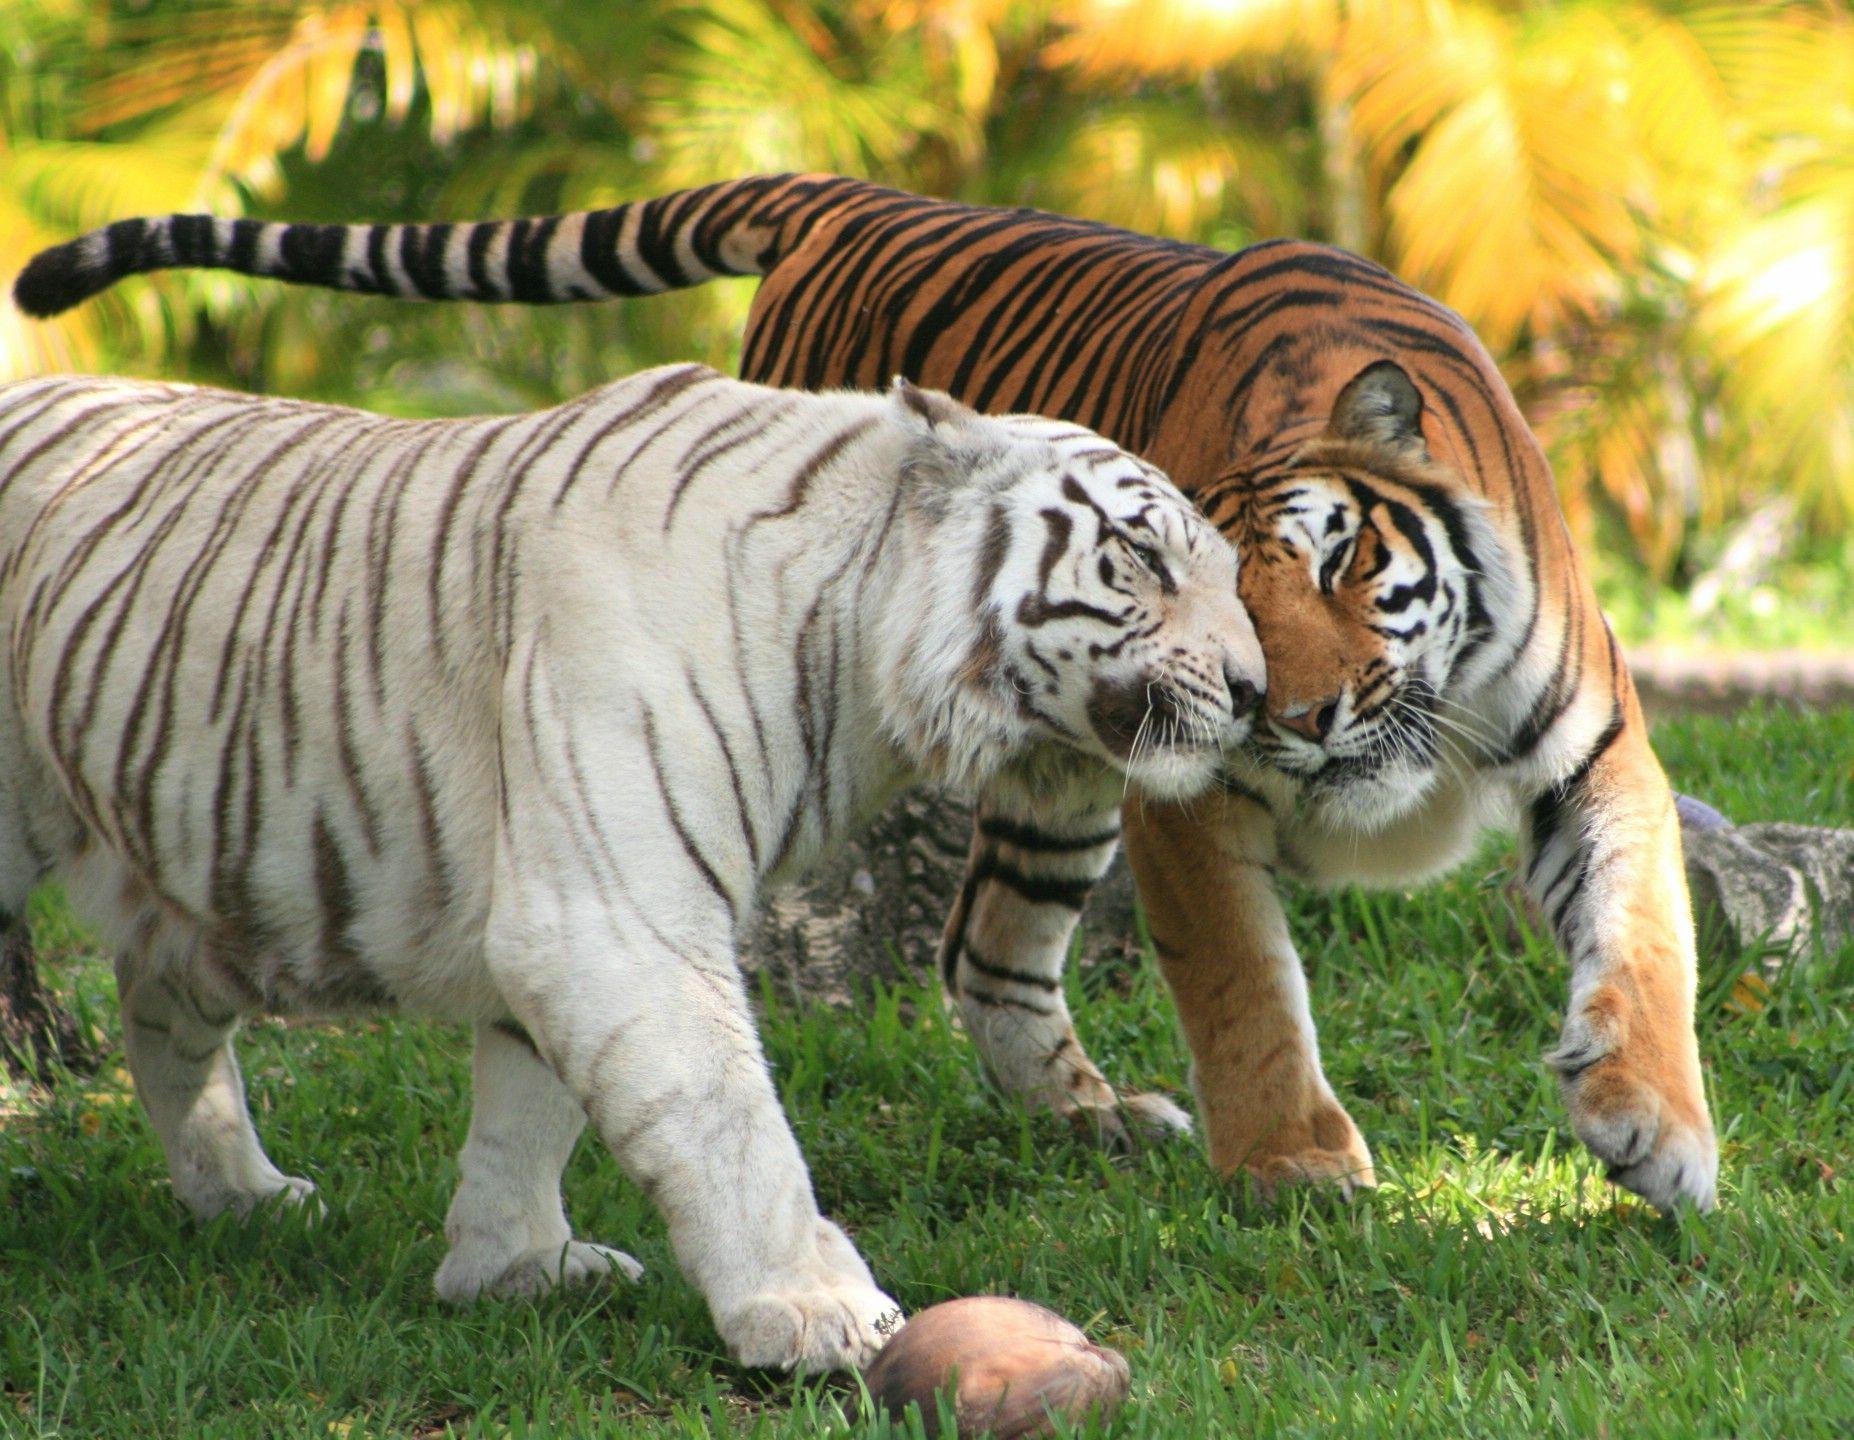 tigre et tigre blanc les chats de loulou et lana pinterest fond ecran hd ecran hd et fond. Black Bedroom Furniture Sets. Home Design Ideas